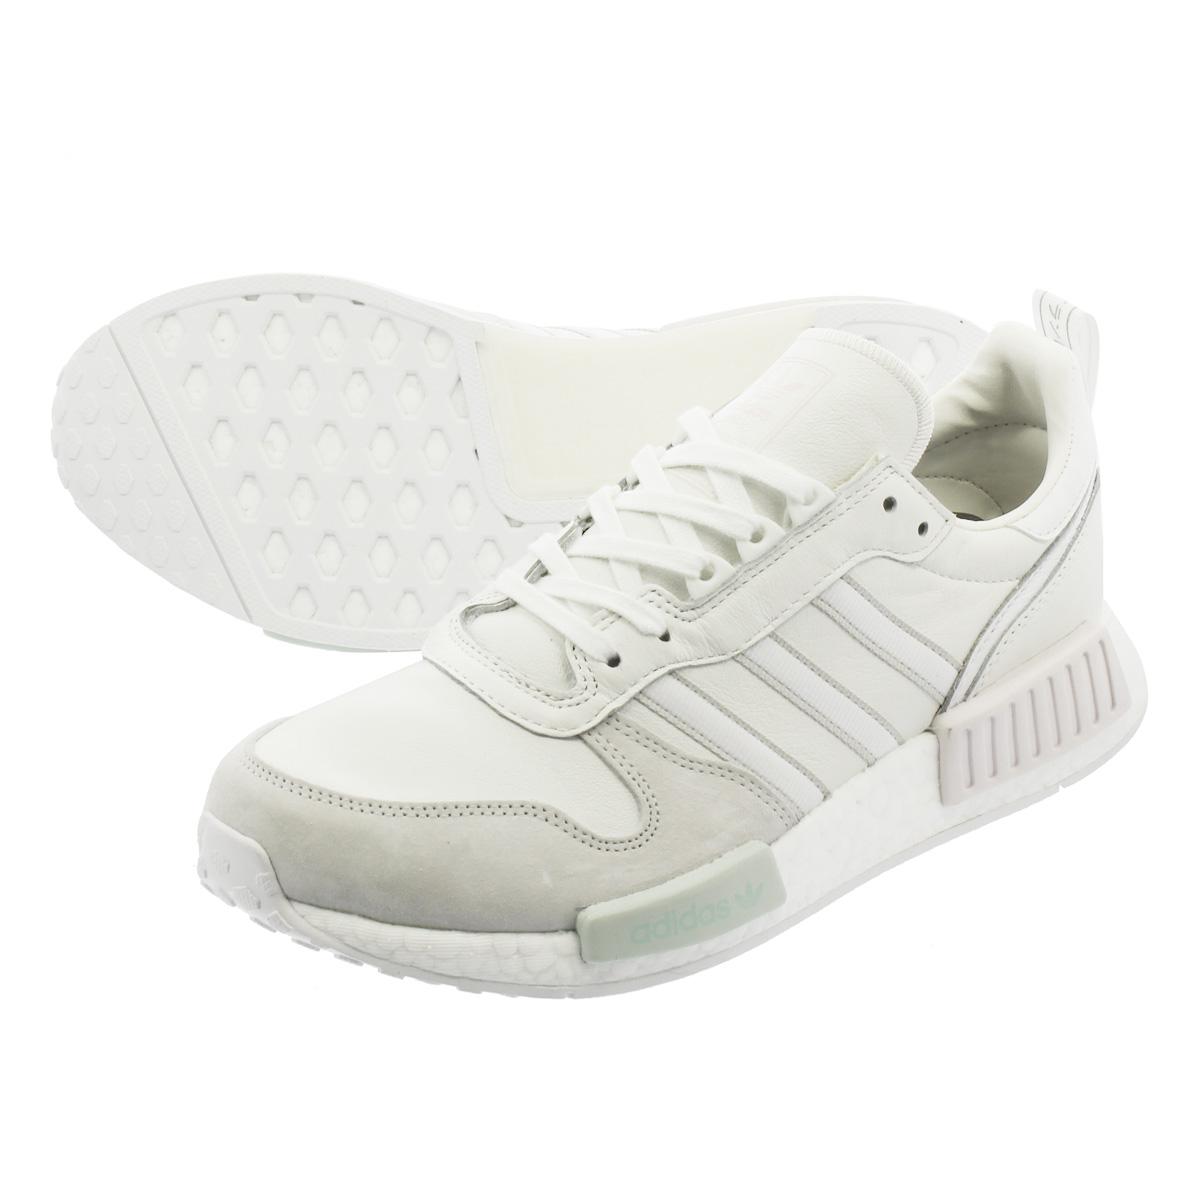 best website 71d82 32aab adidas RISINGSTAR x R1 Adidas rising star x R1 CLOUD WHITE/RUNNING  WHITE/GREY ONE g28939